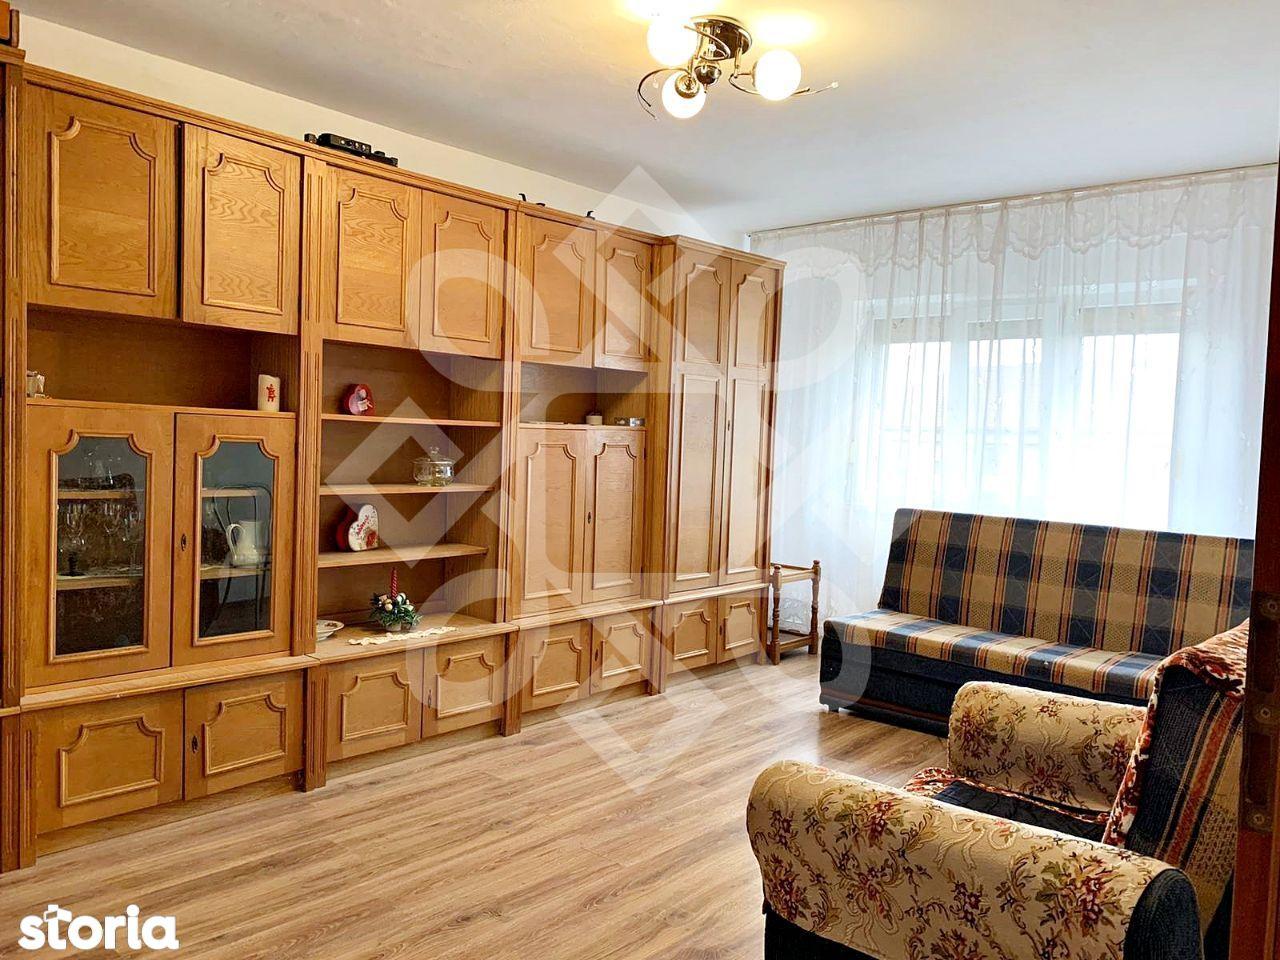 Apartament doua camere de vanzare, tip PB, Rogerius, Oradea